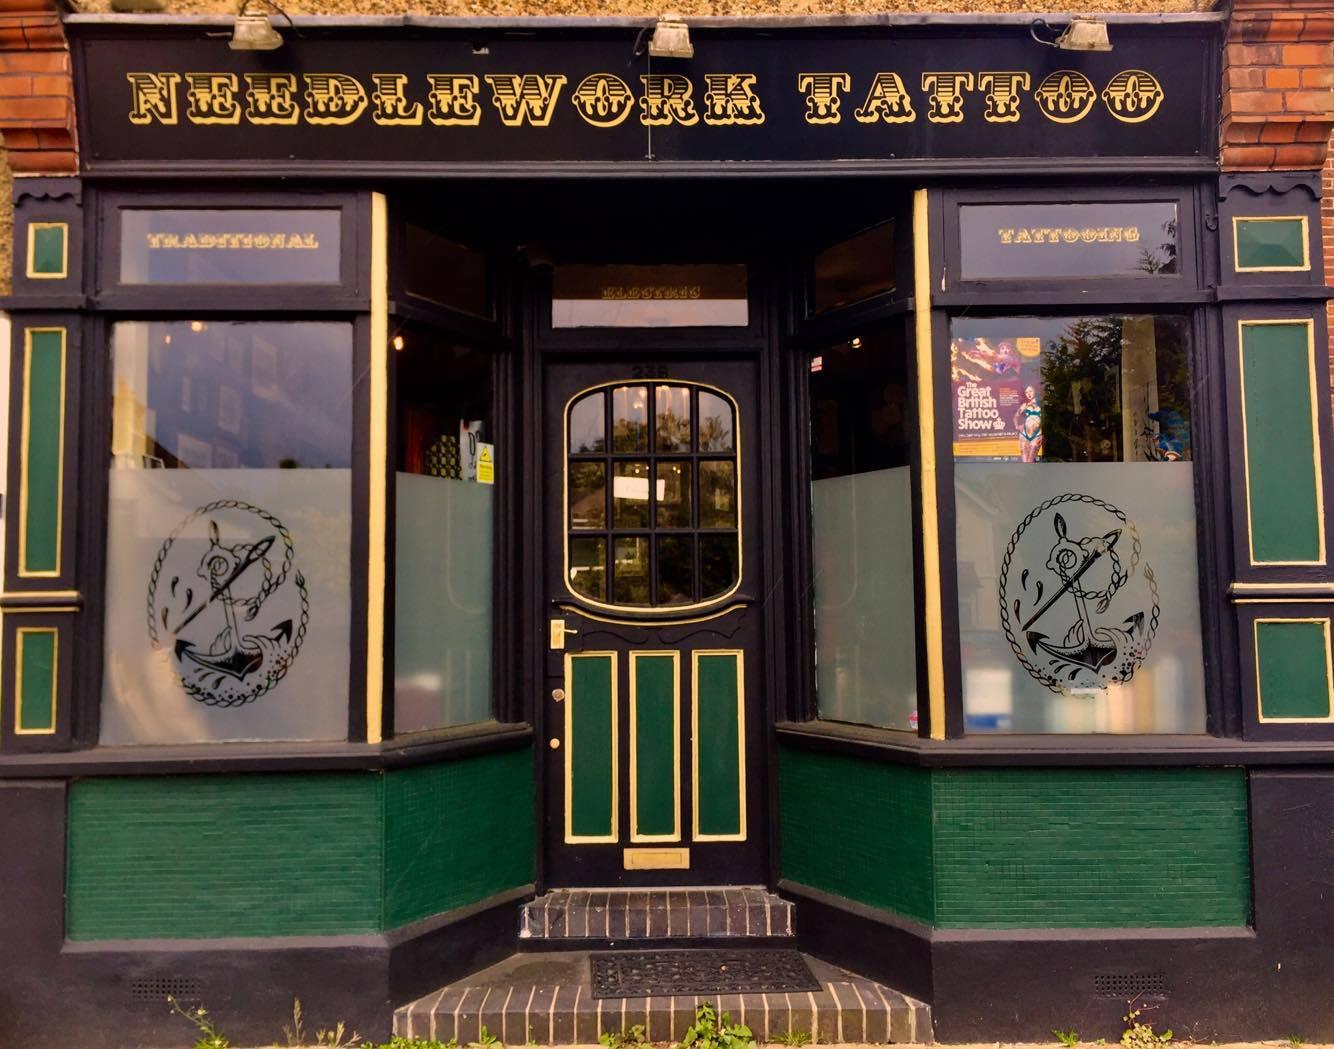 Needlework Tattoo